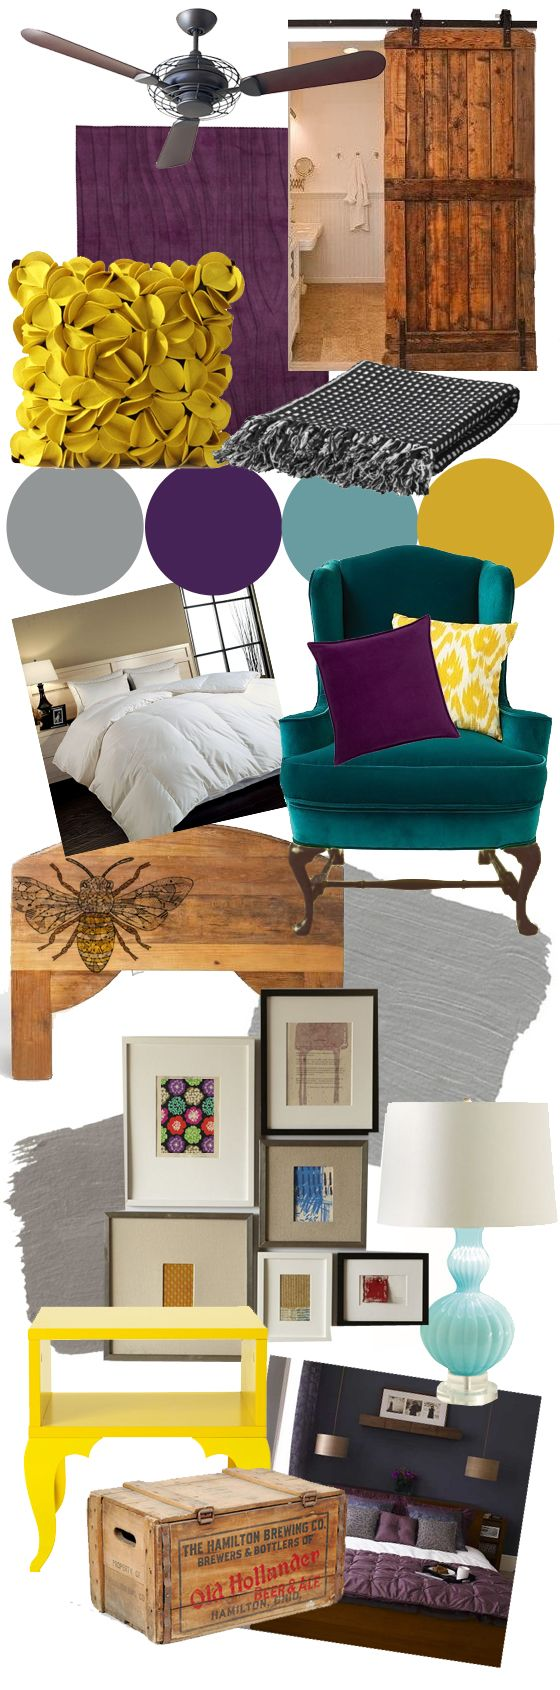 10 Teal Purple And Mustard Living Room Ideas Room Colors